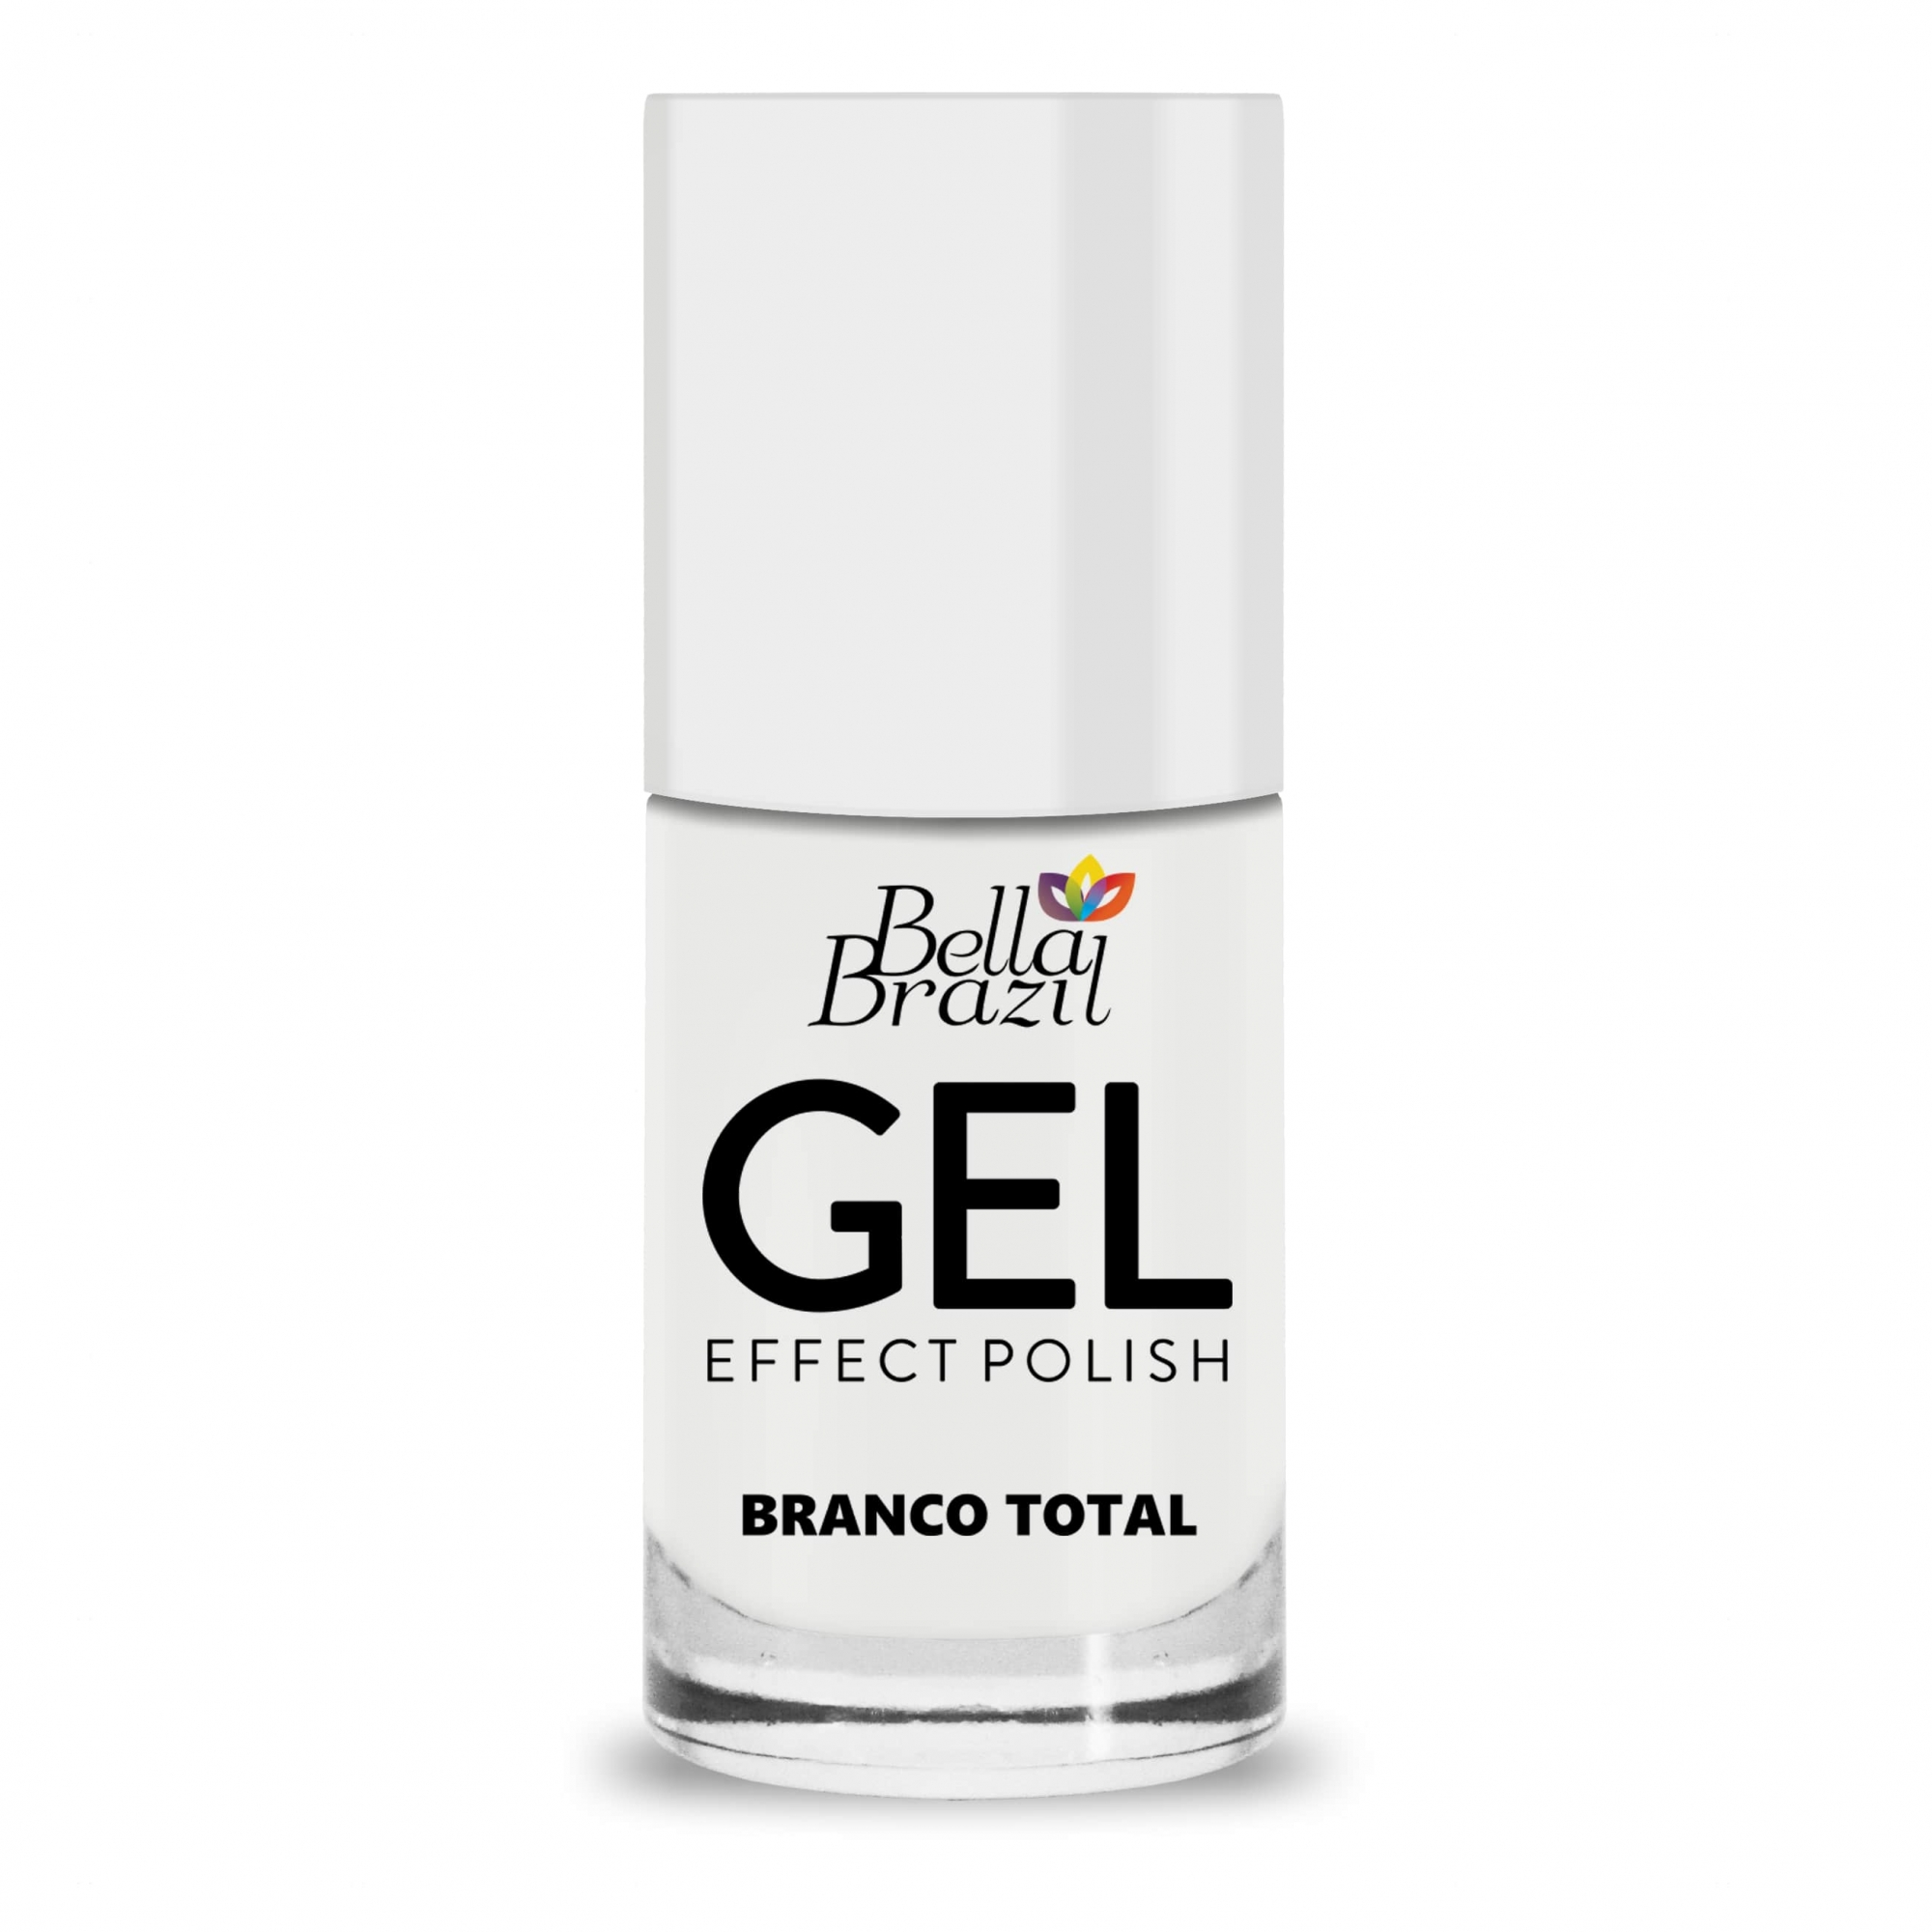 Esmalte Efeito Gel Branco Total 8ml Bella Brazil